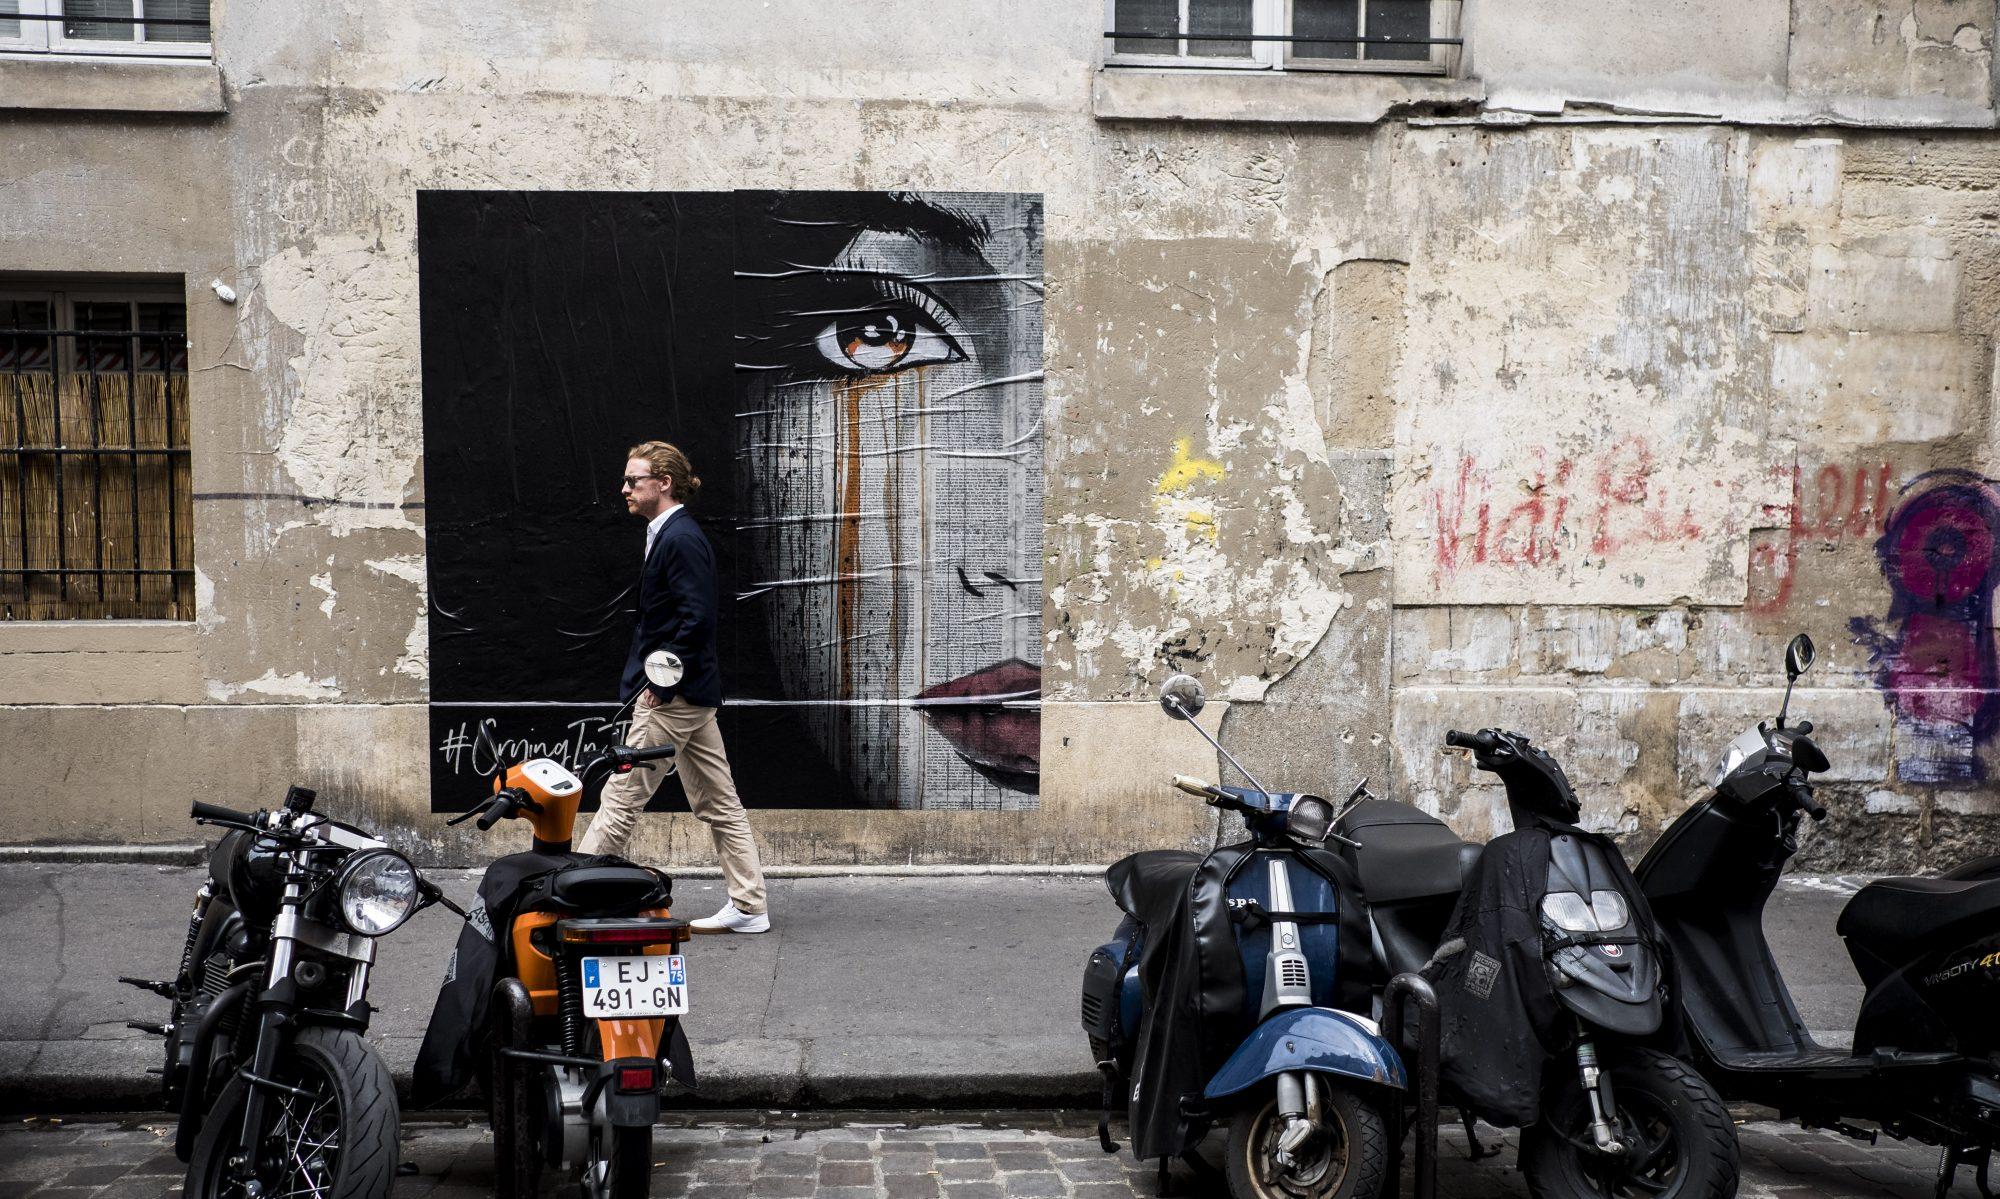 Christian Irrgang | Fotoreporter